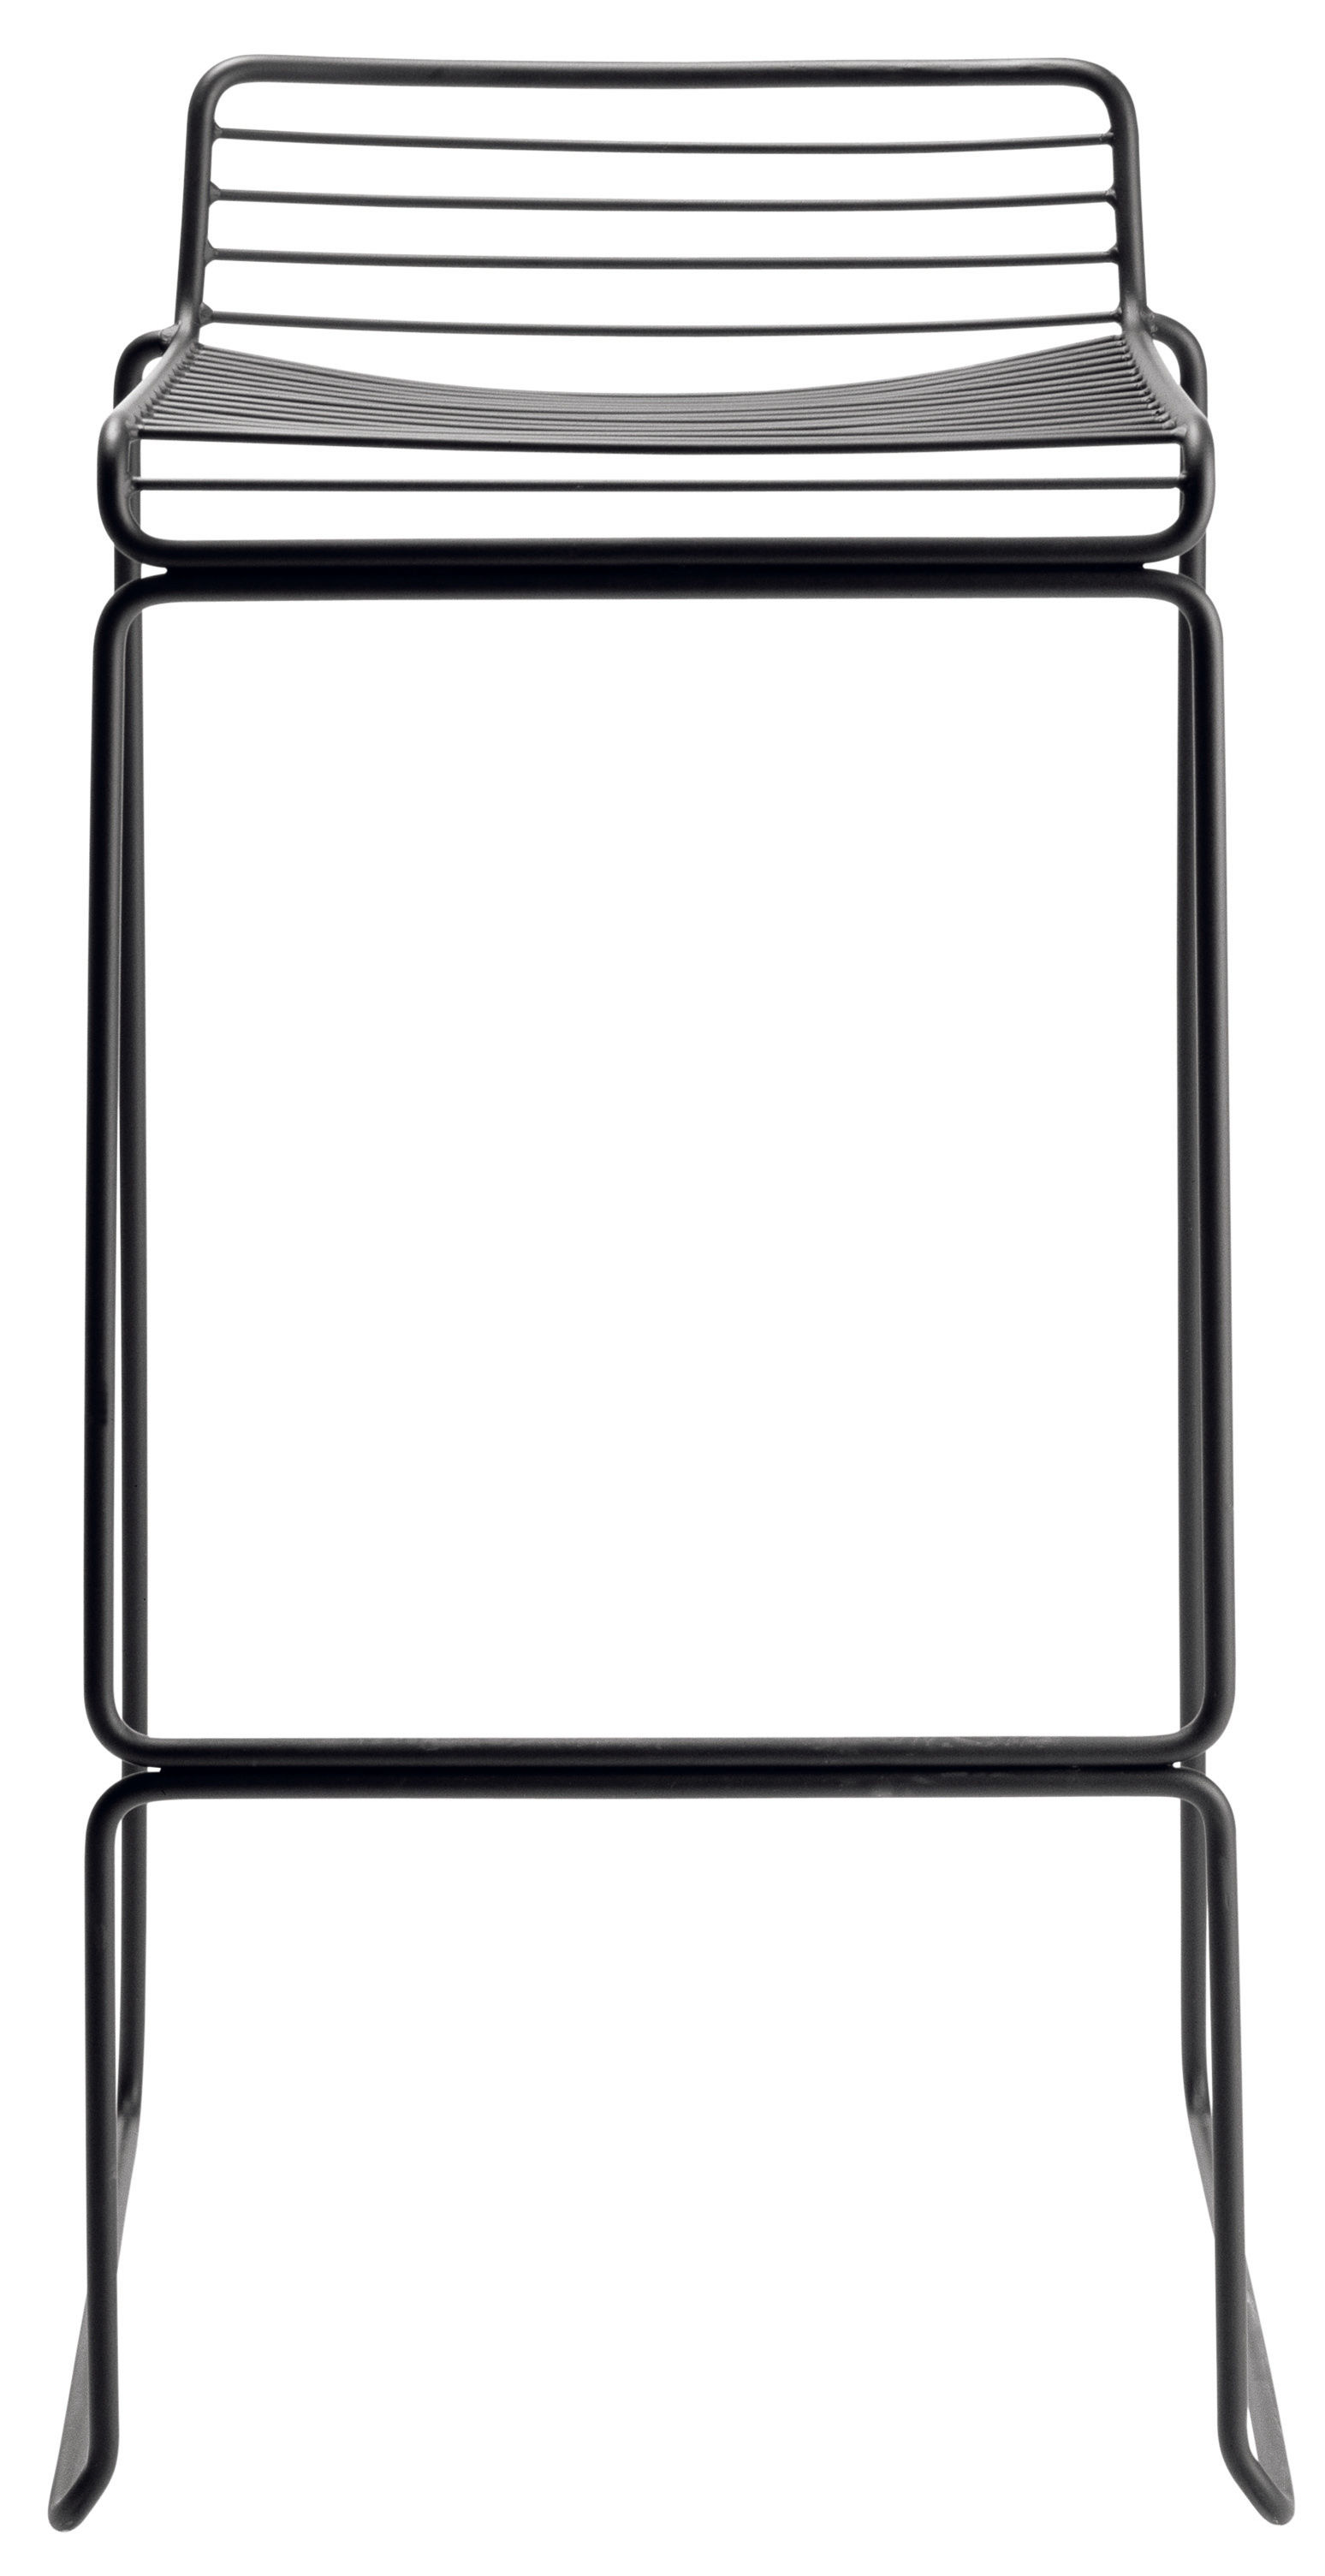 Mobilier - Tabourets de bar - Tabouret de bar Hee / H 75 cm - Métal - Hay - Noir - Acier laqué